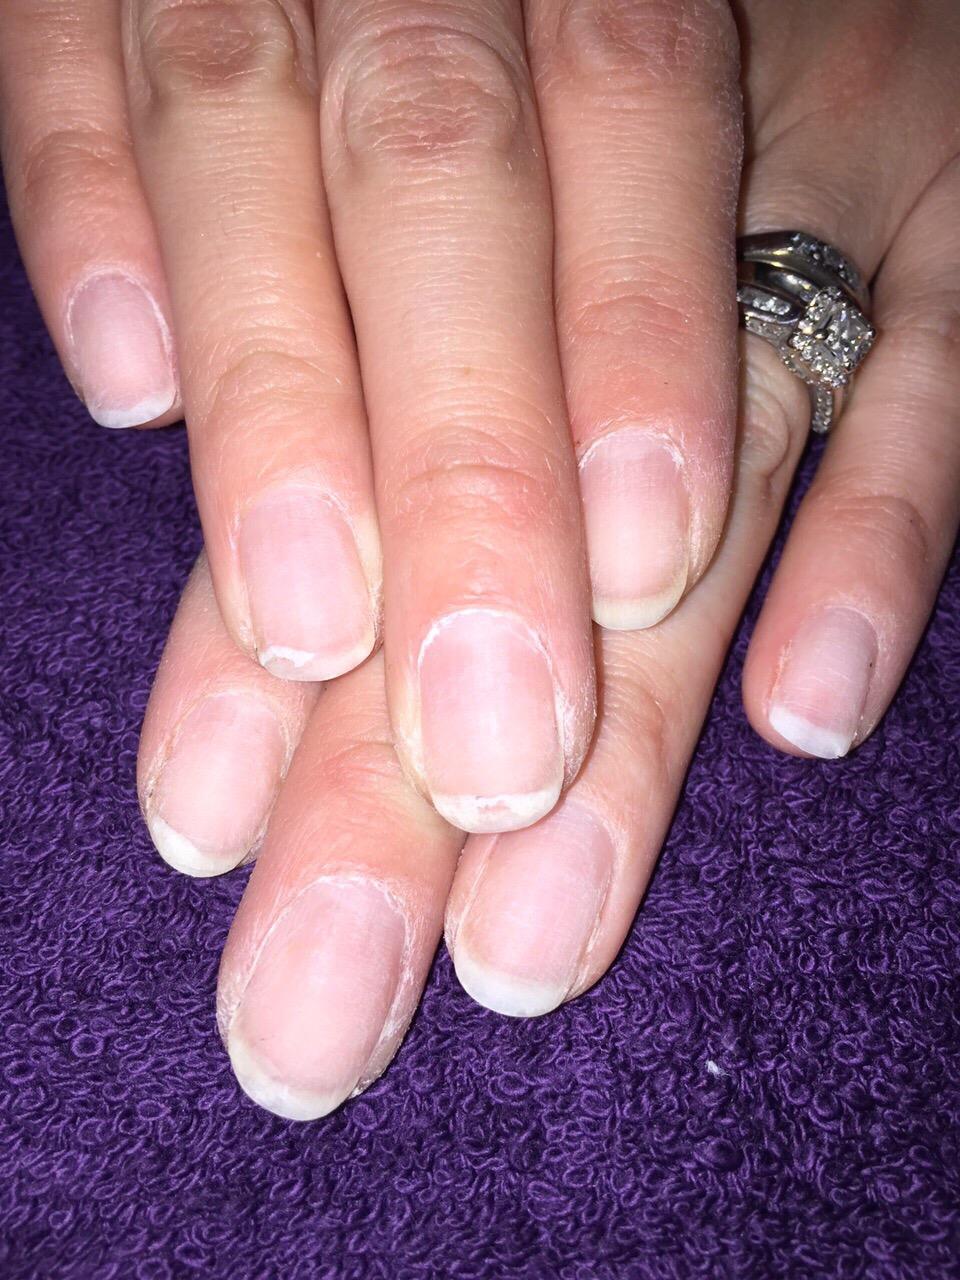 ibx treatment – moonshinesnails